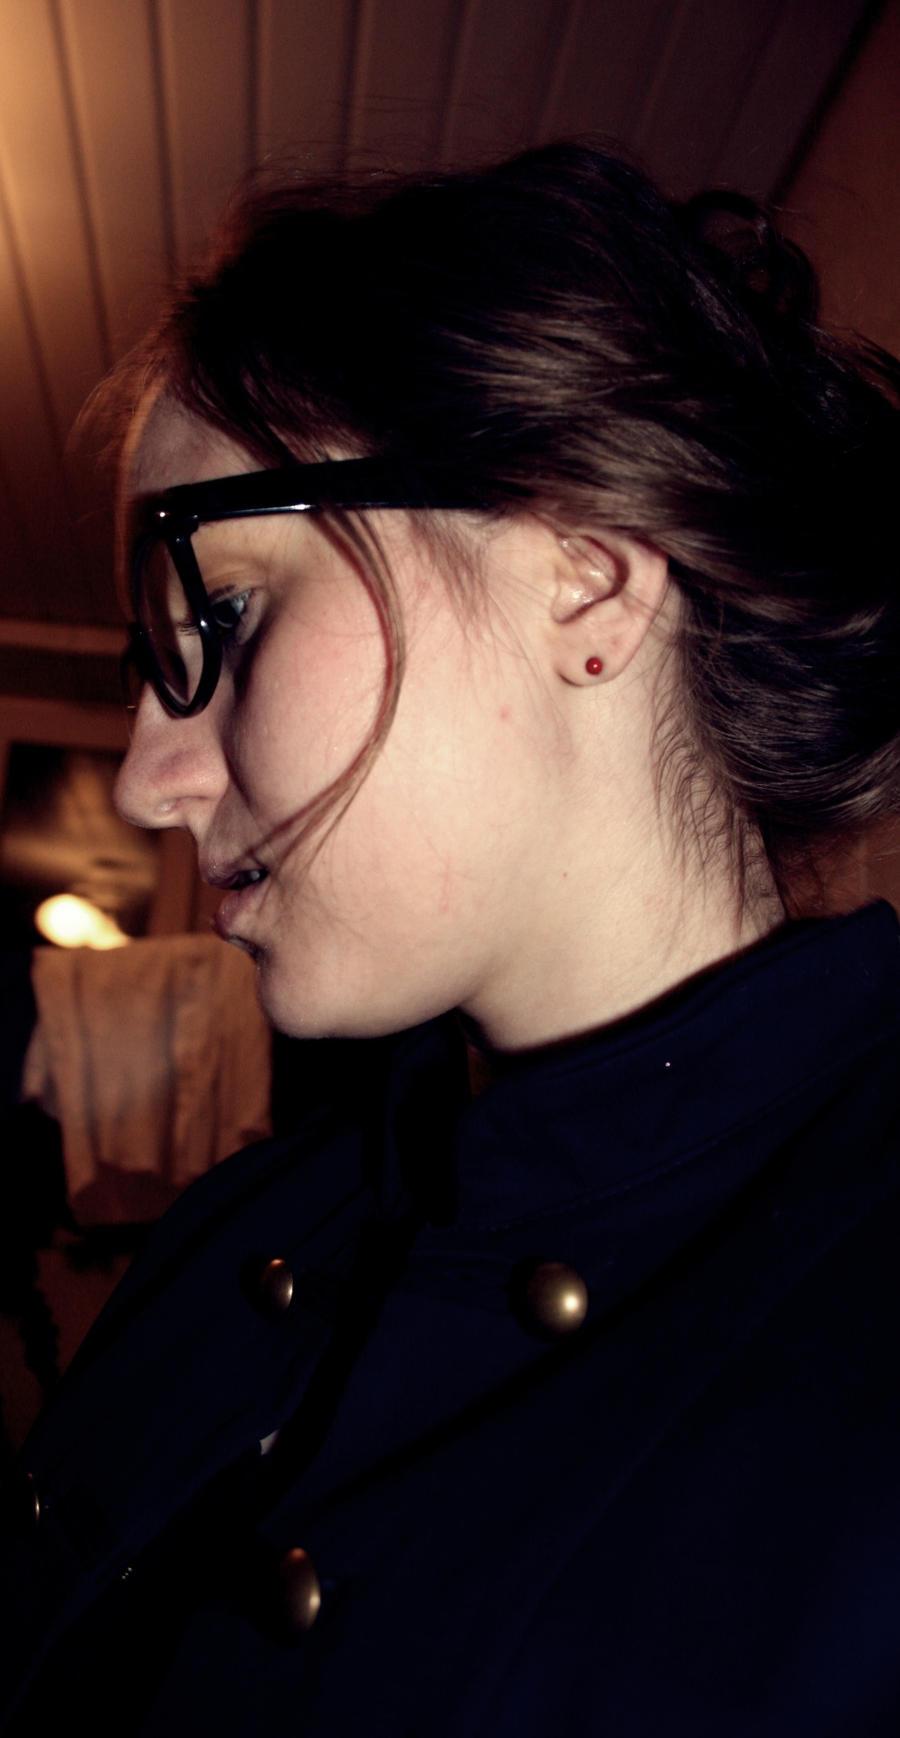 kaatherine's Profile Picture